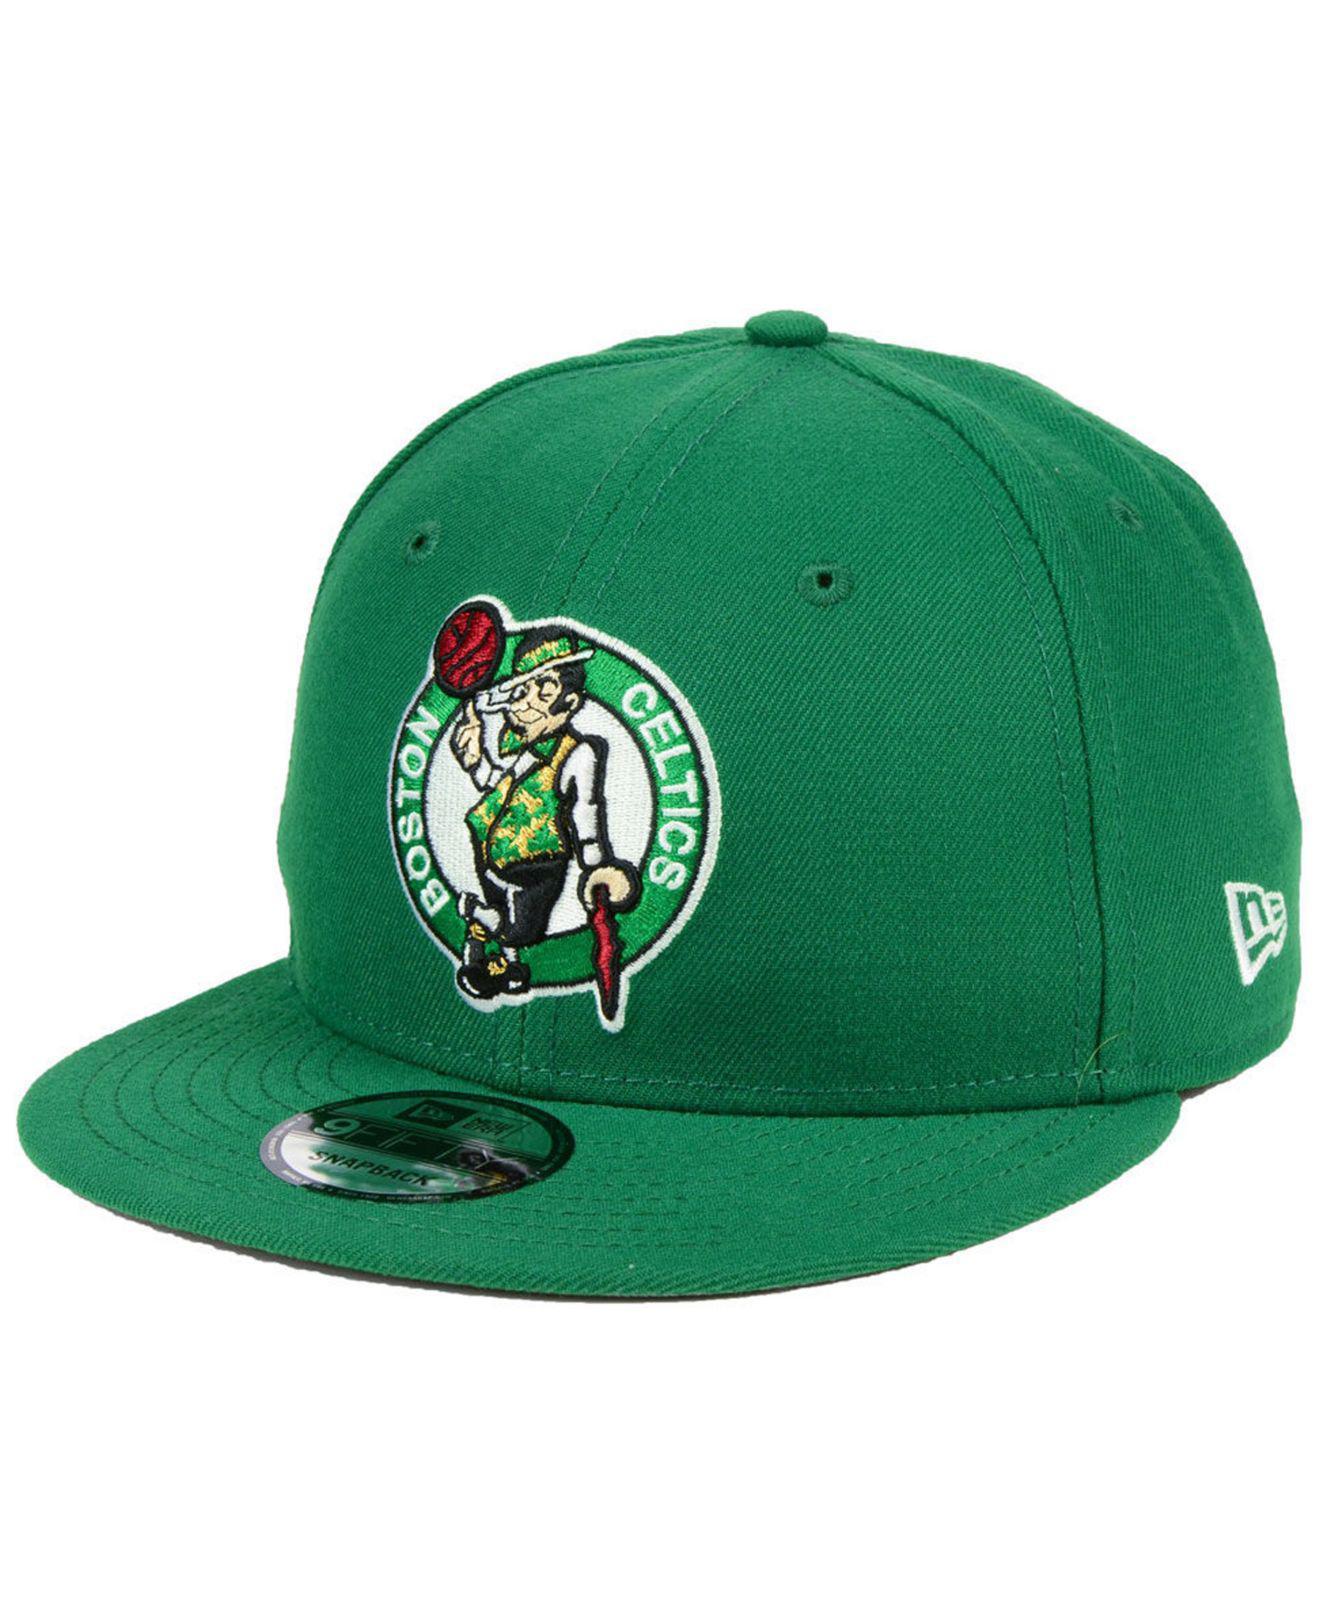 best deals on b3a4b f8631 ... sweden ktz green boston celtics basic 9fifty snapback cap for men lyst. view  fullscreen 0741c